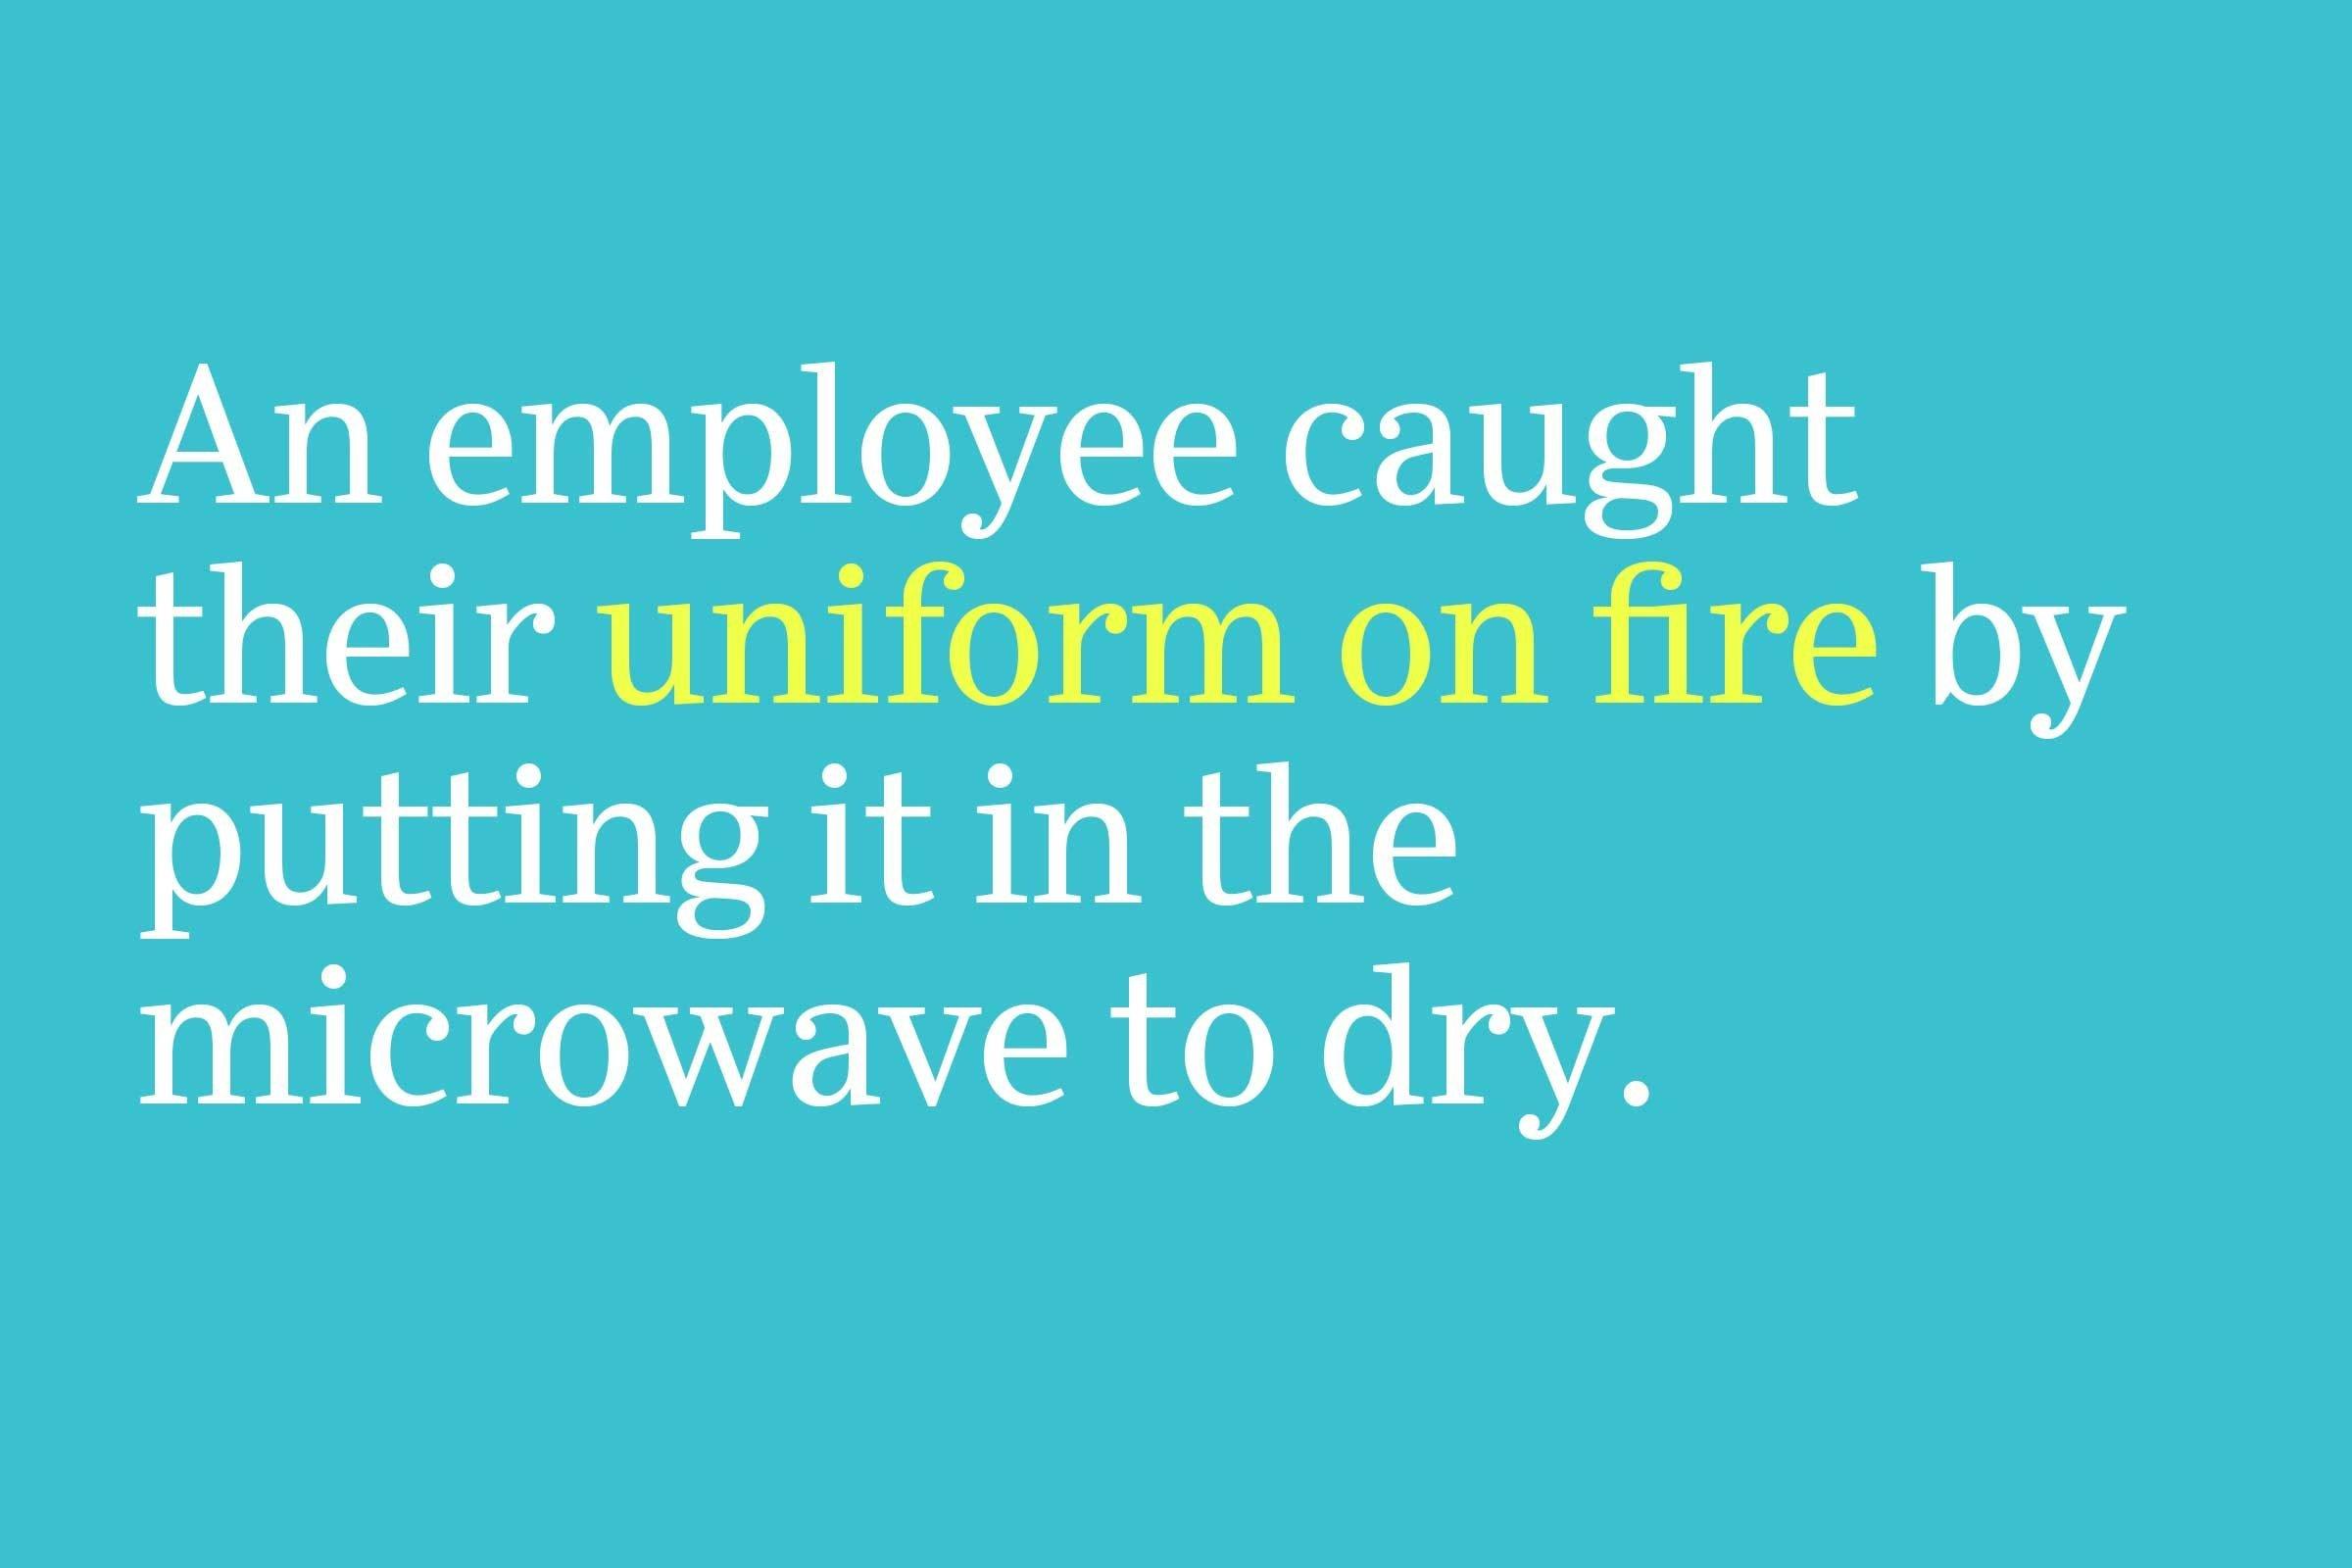 uniform on fire